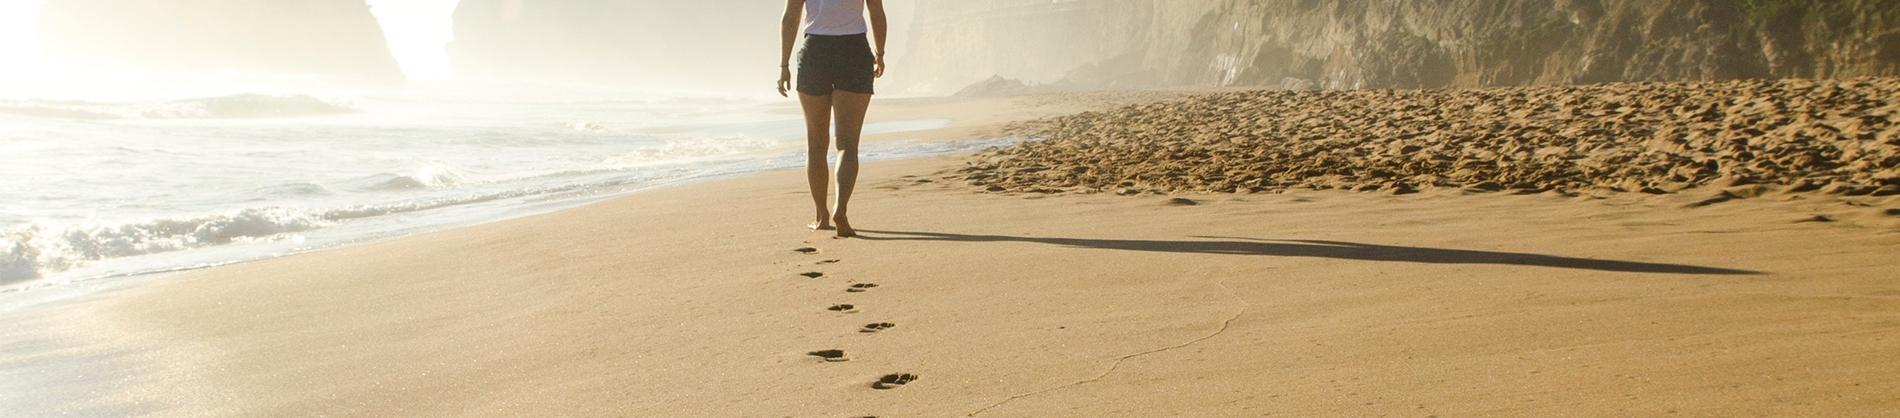 A women walking along the beach leaving footprints in the sand